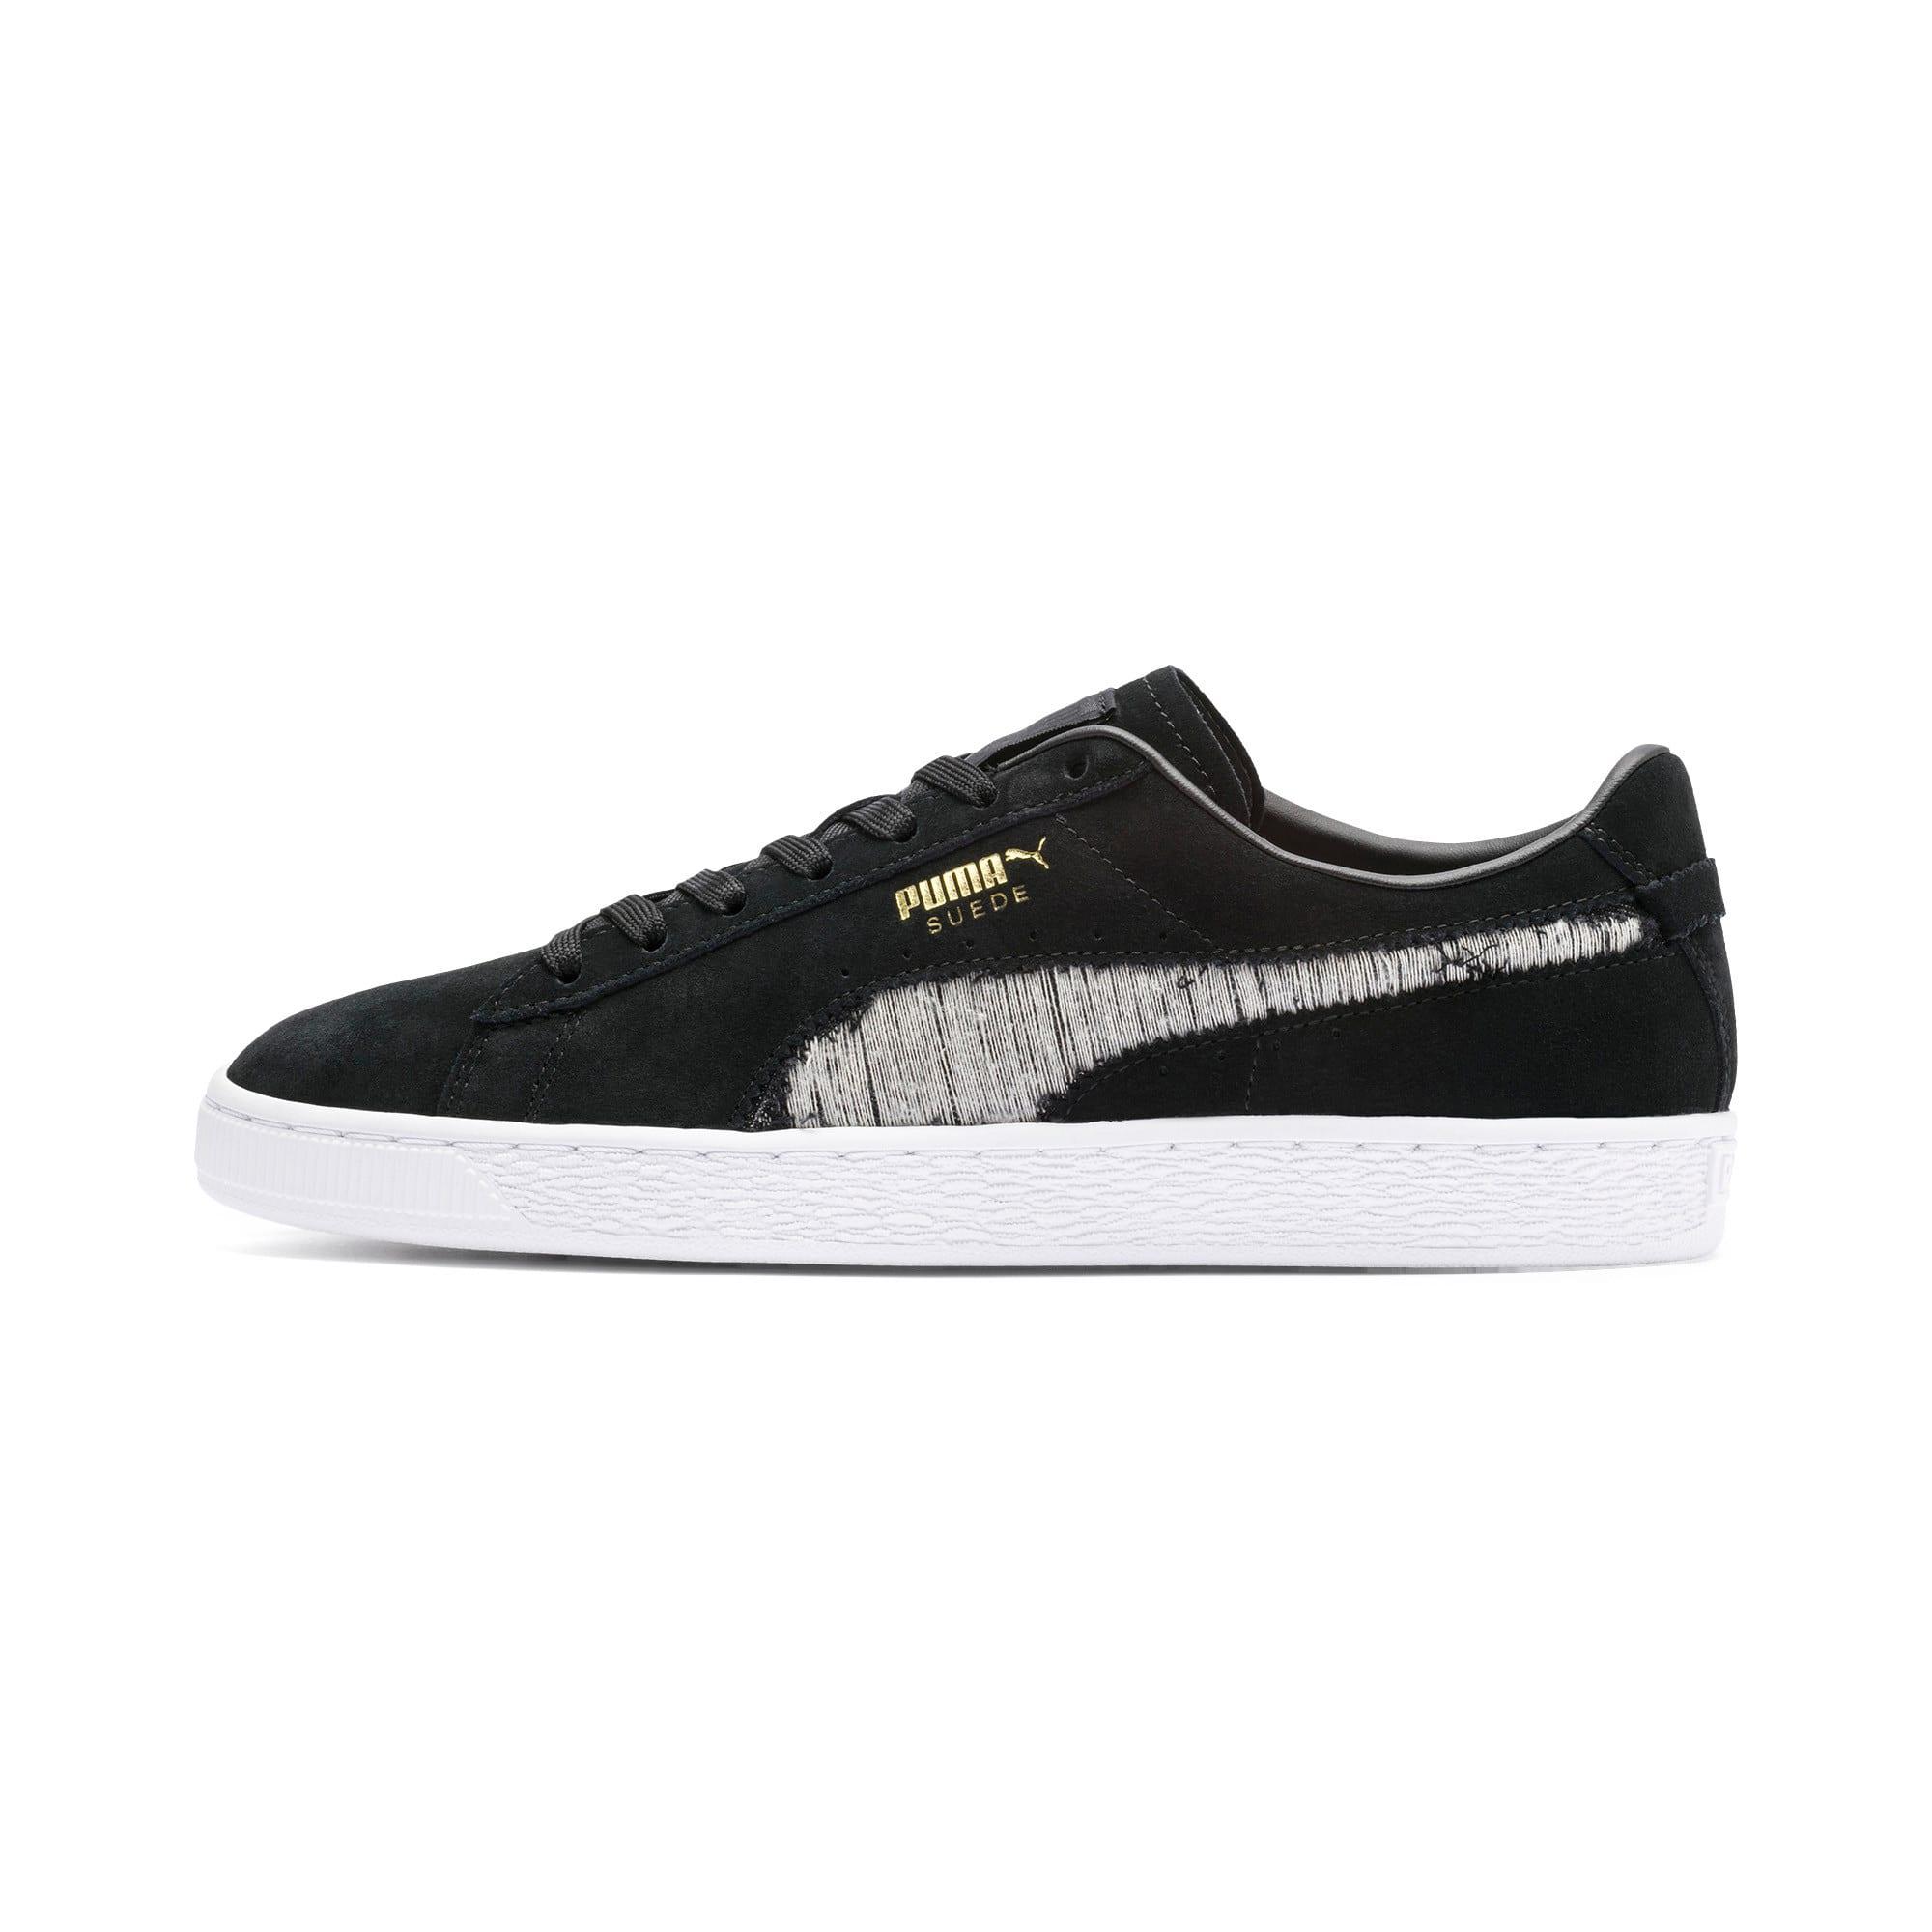 Thumbnail 1 of Suede Ripped Denim Sneakers, Puma Black-P Black-P White, medium